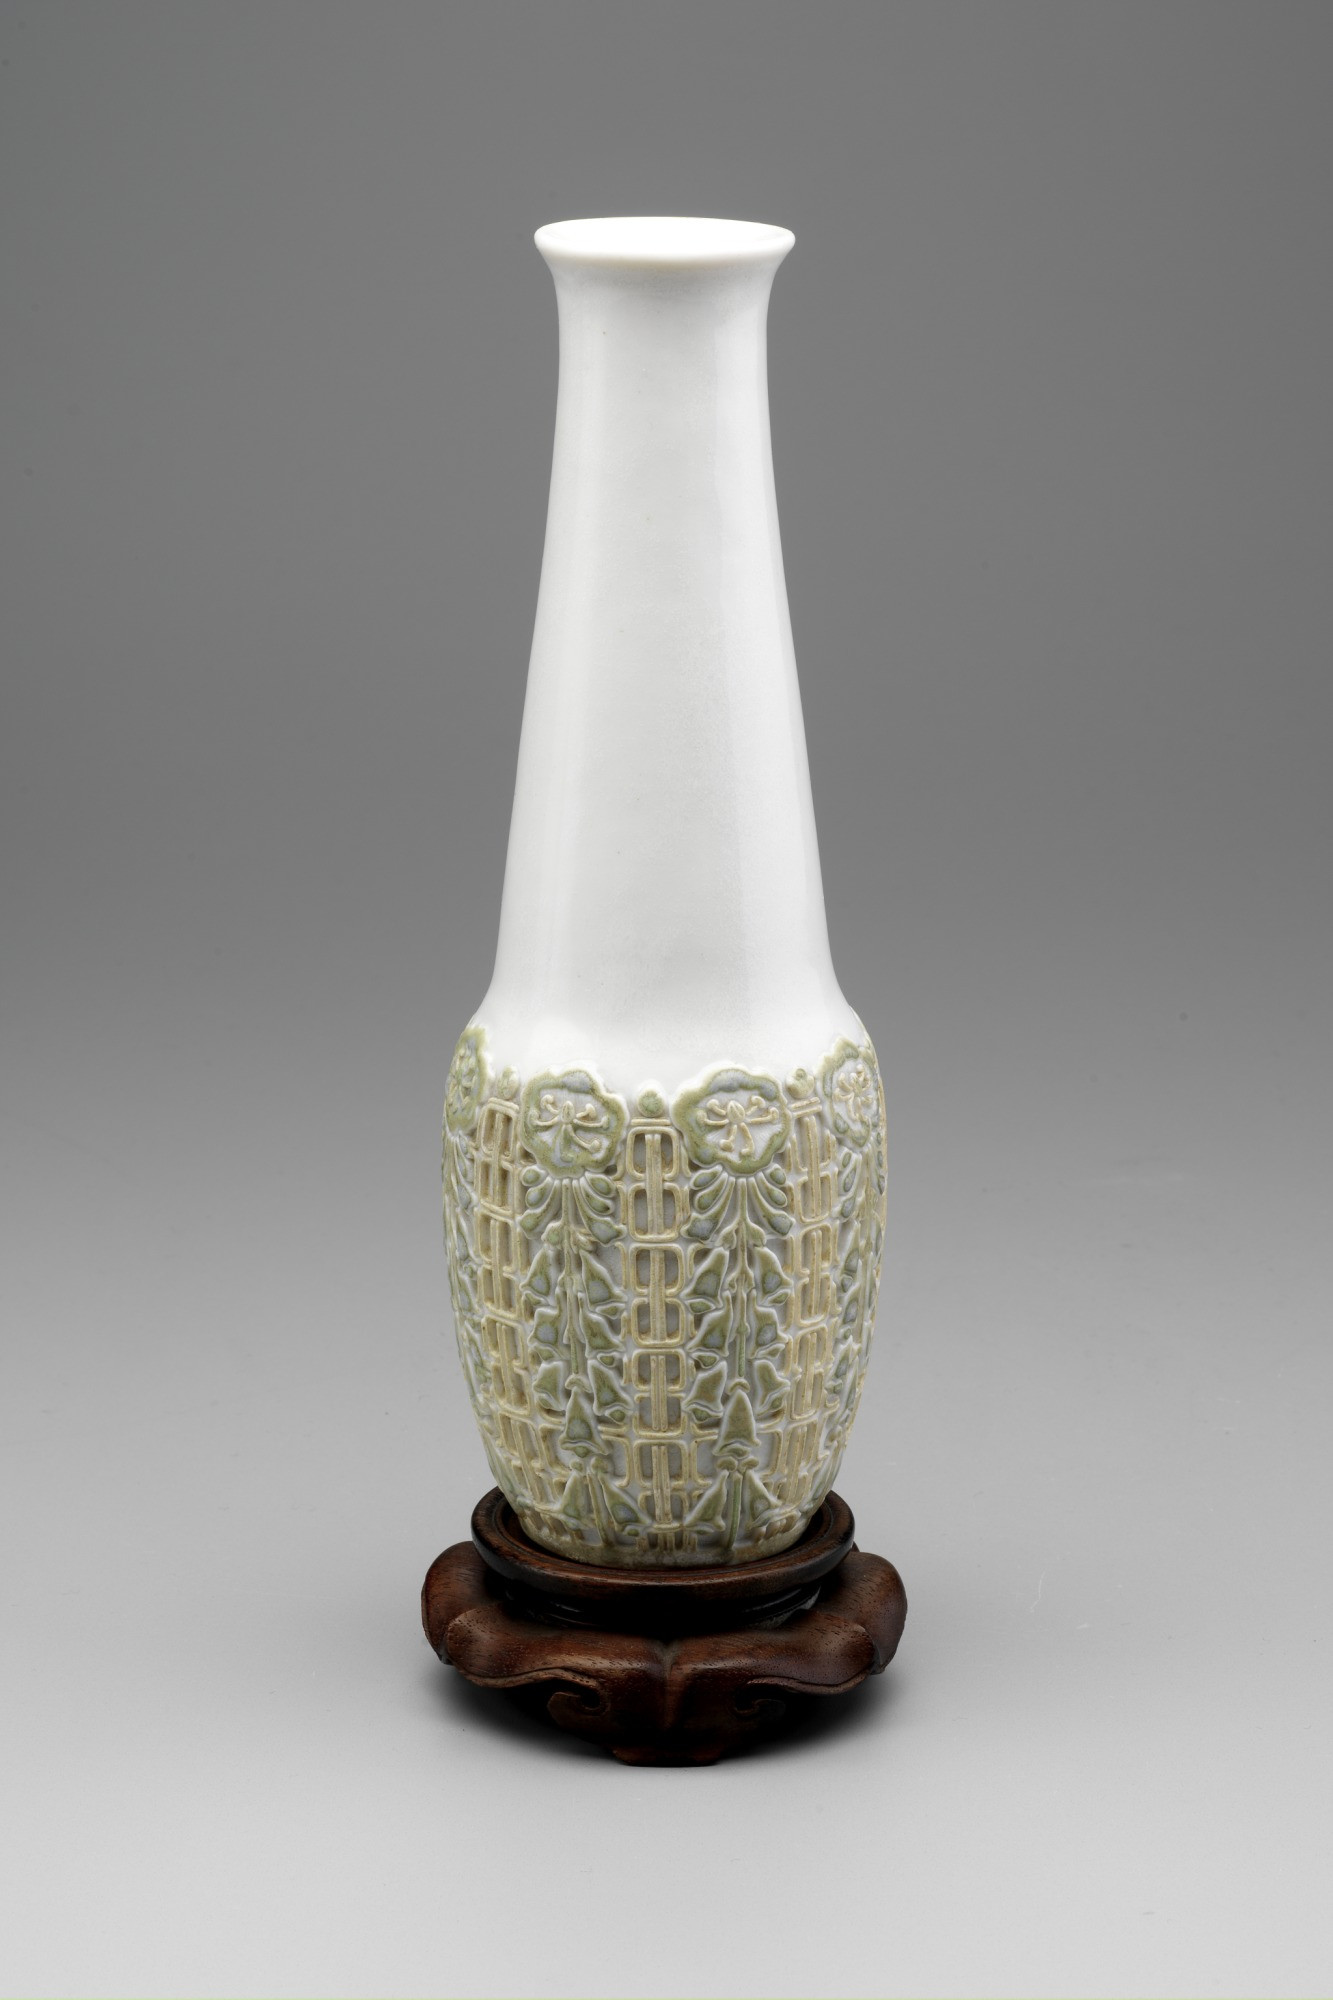 jonathan adler gala vase of vase detroit institute of arts museum regarding adelaide alsop robineau vase 1914 porcelain with teak base detroit institute of